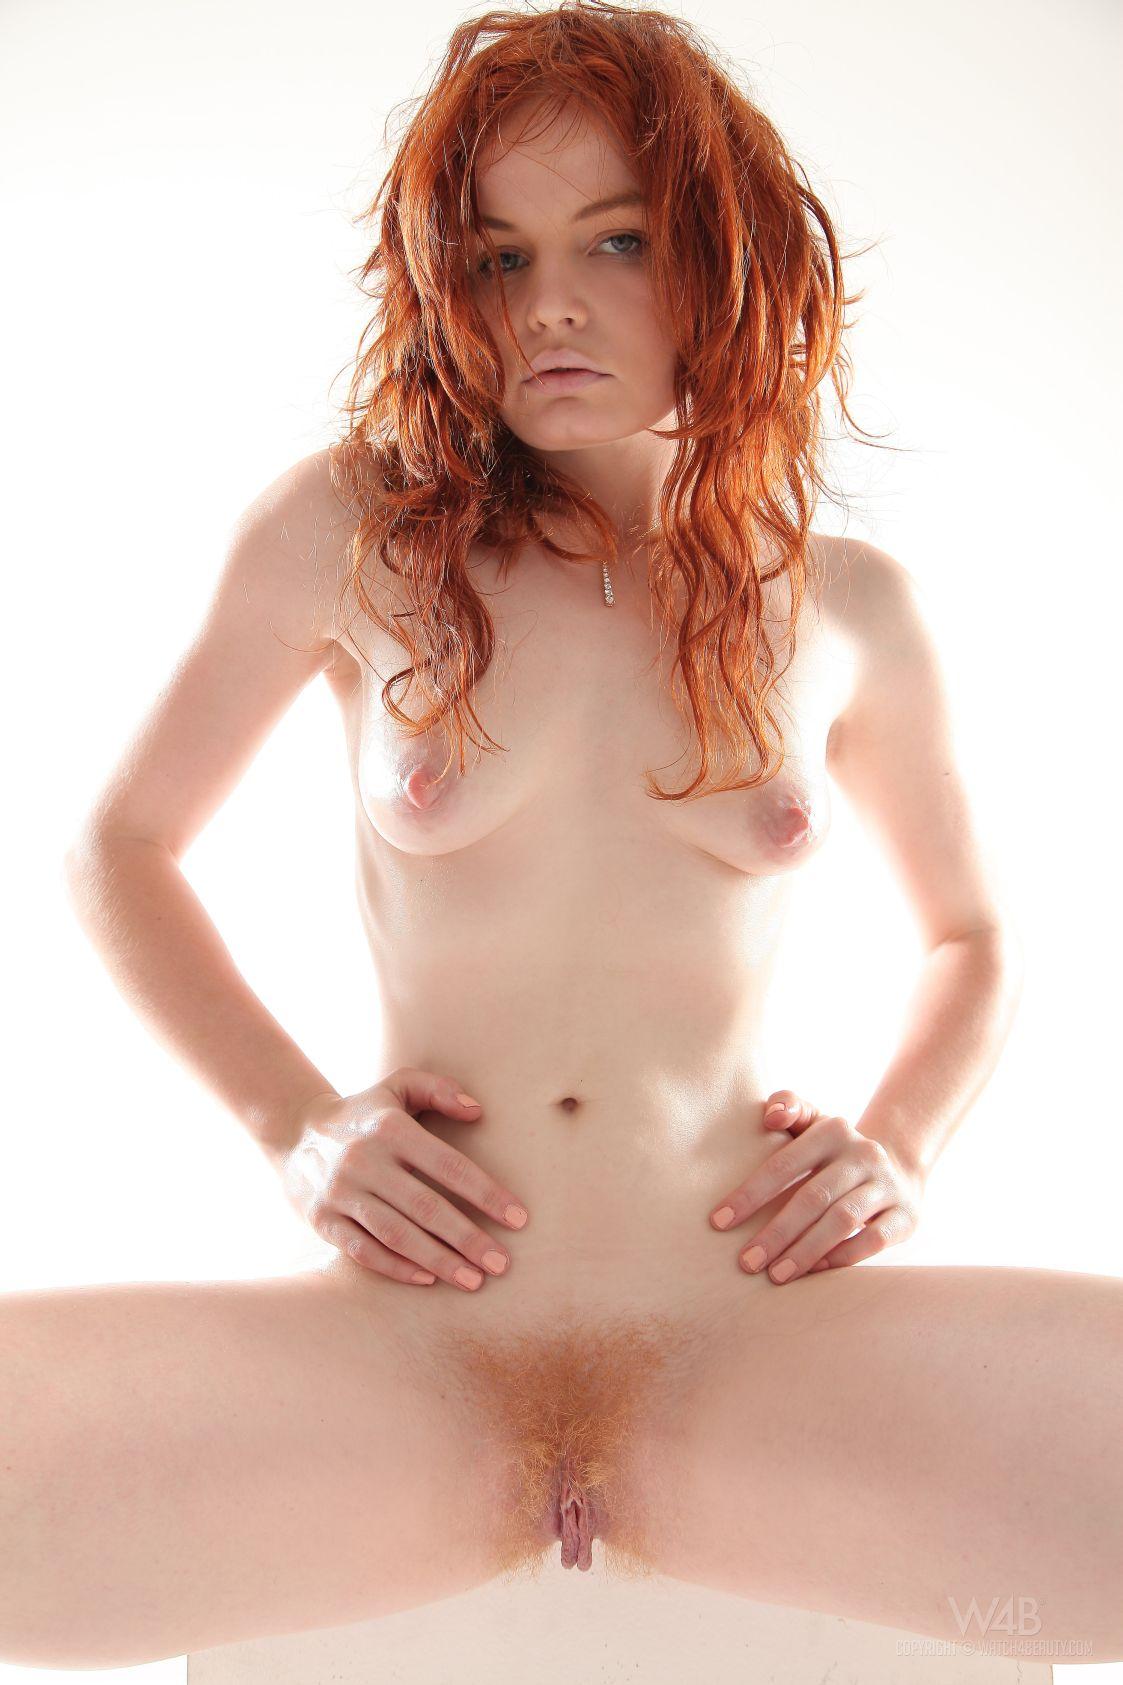 redhead s m galleries hd